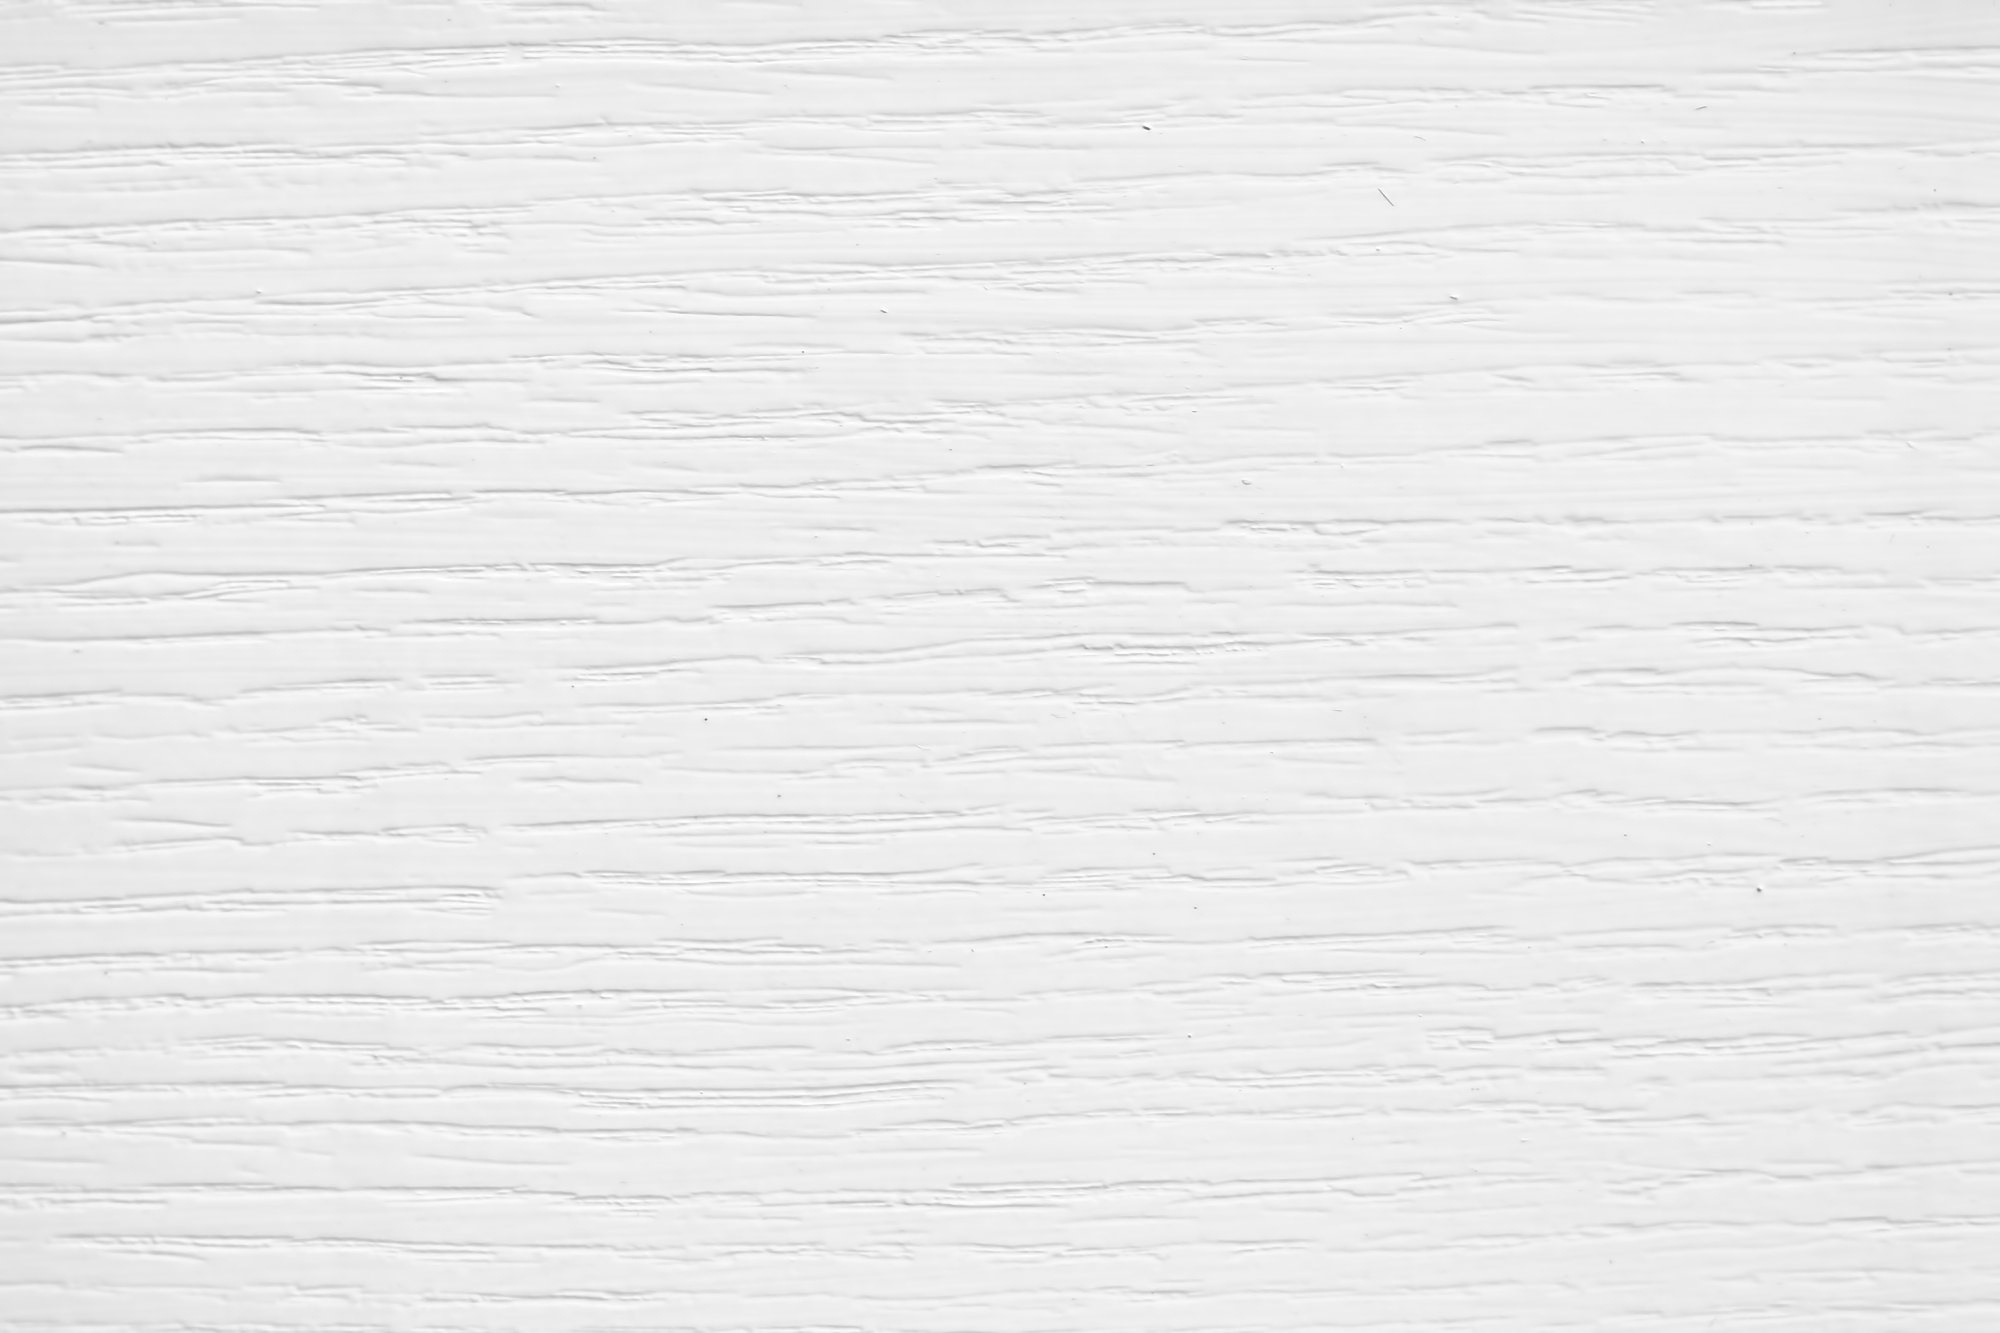 white_wood